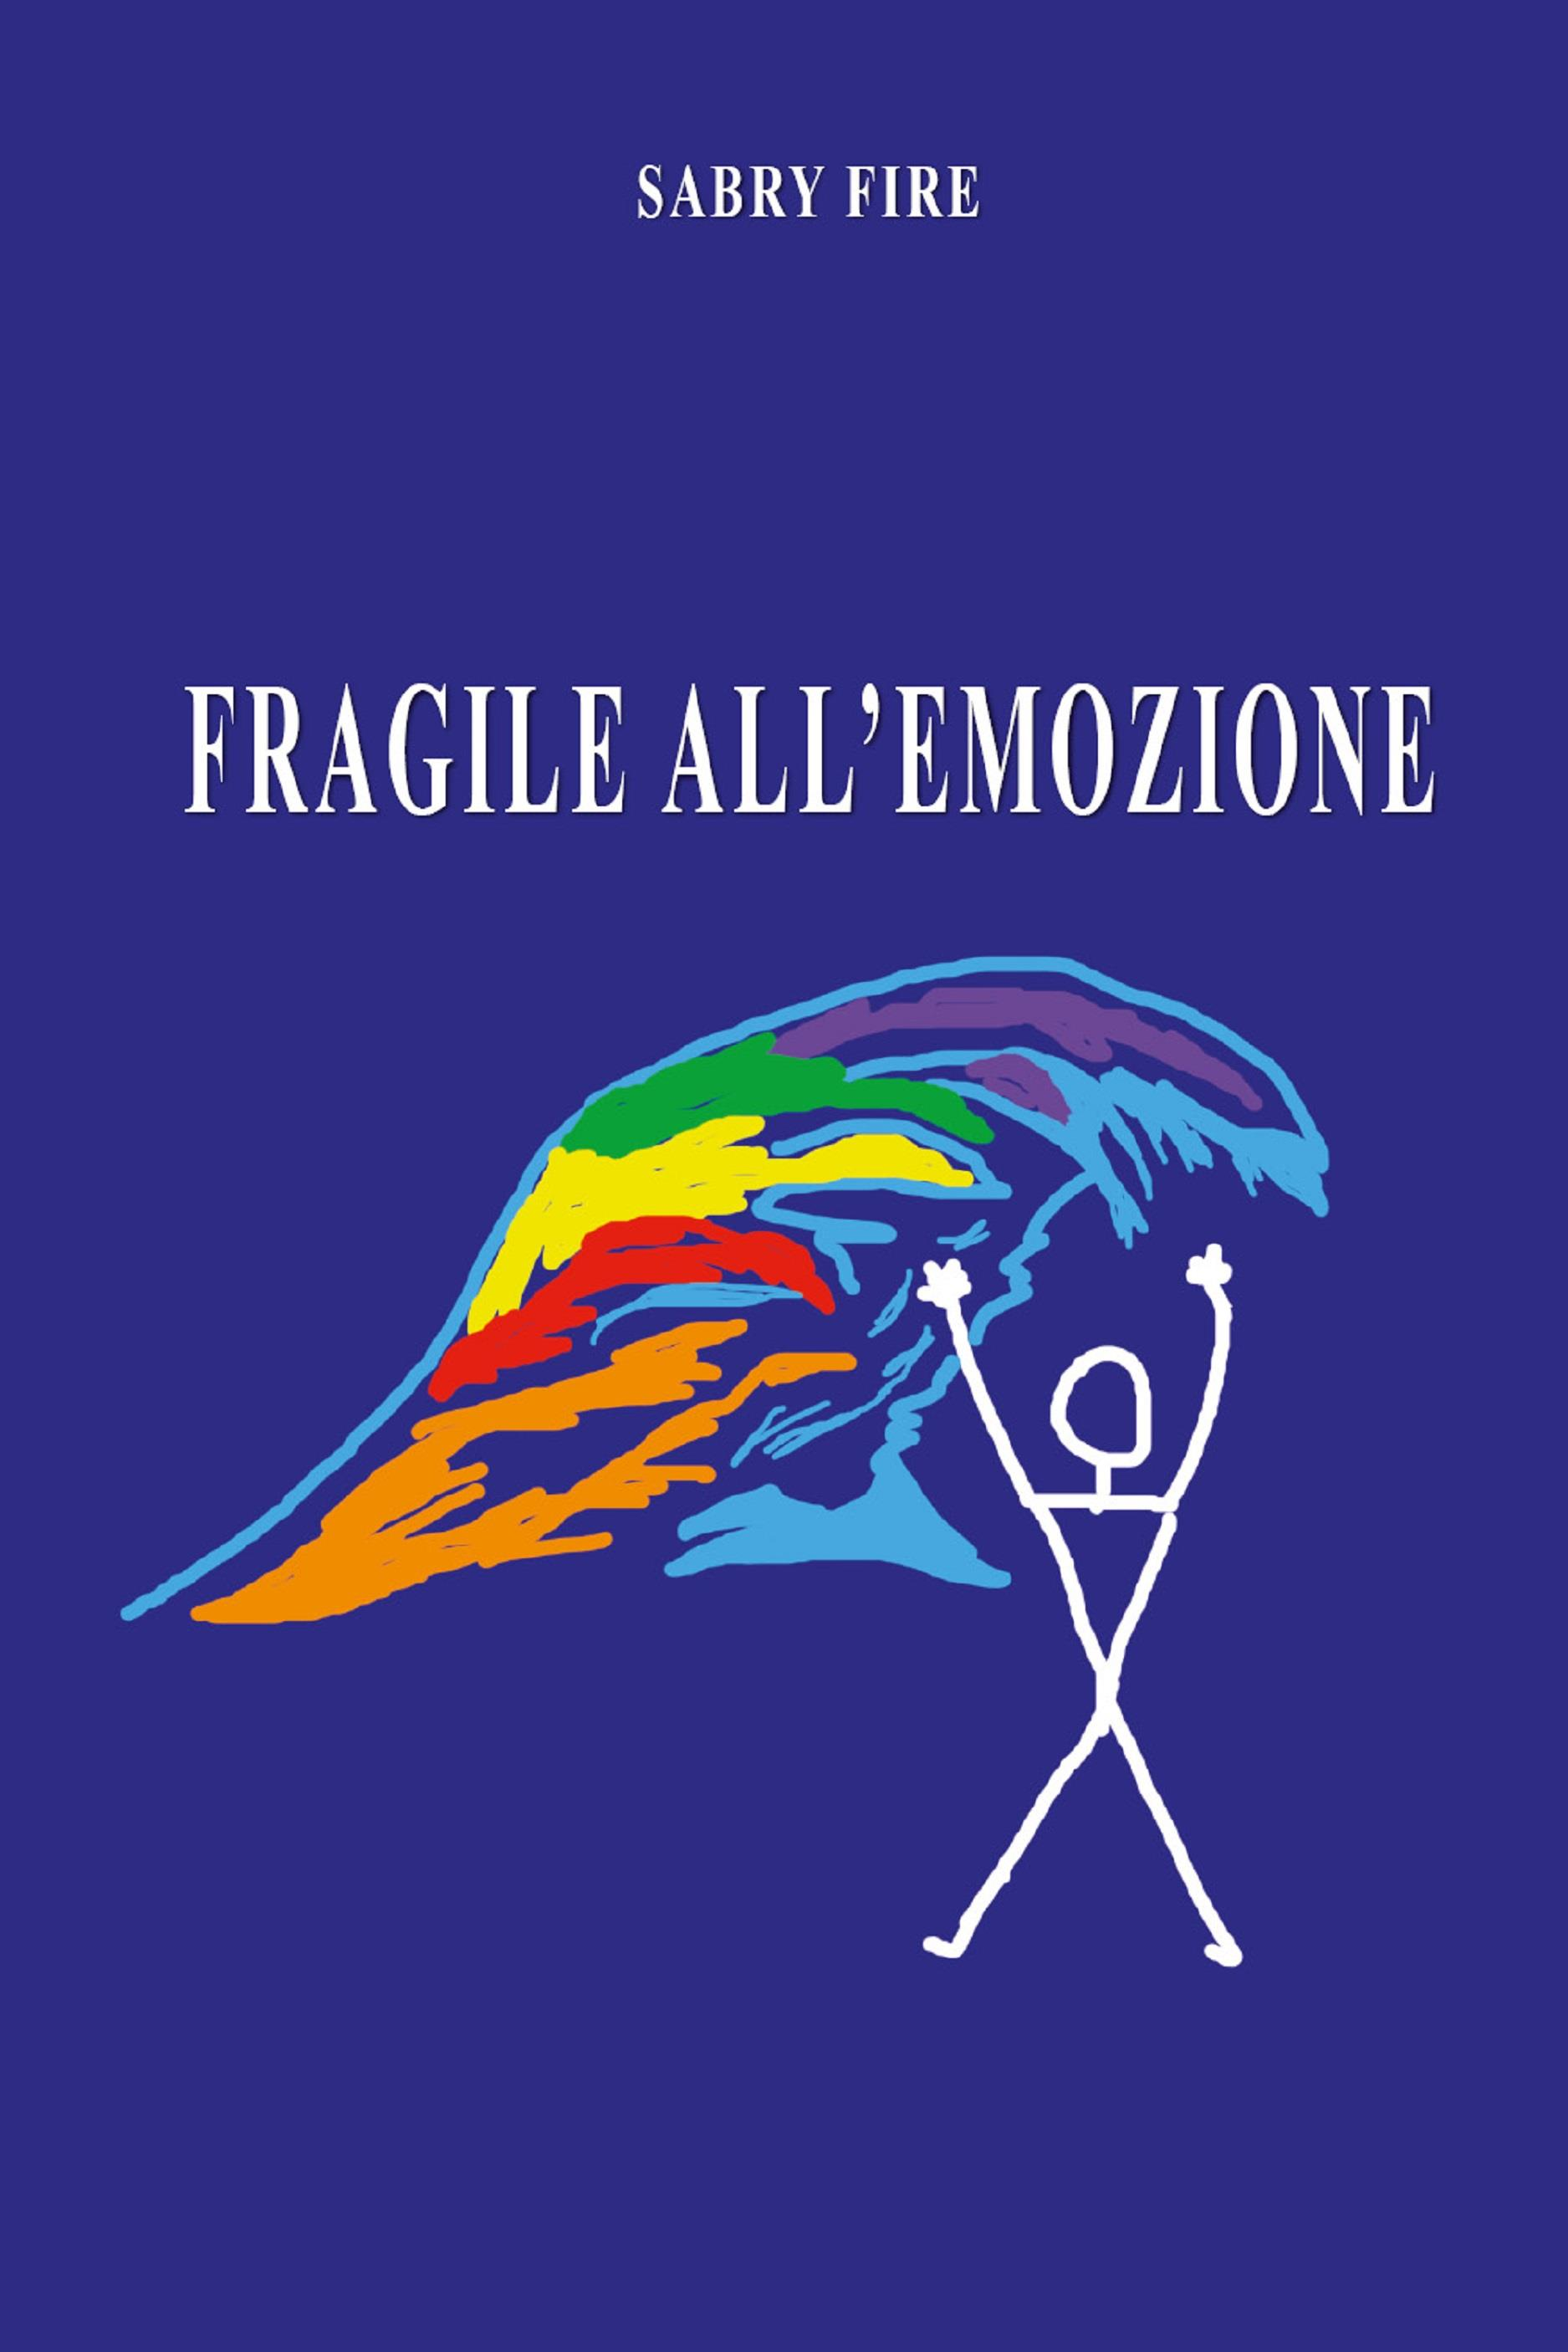 Fragile all'emozione